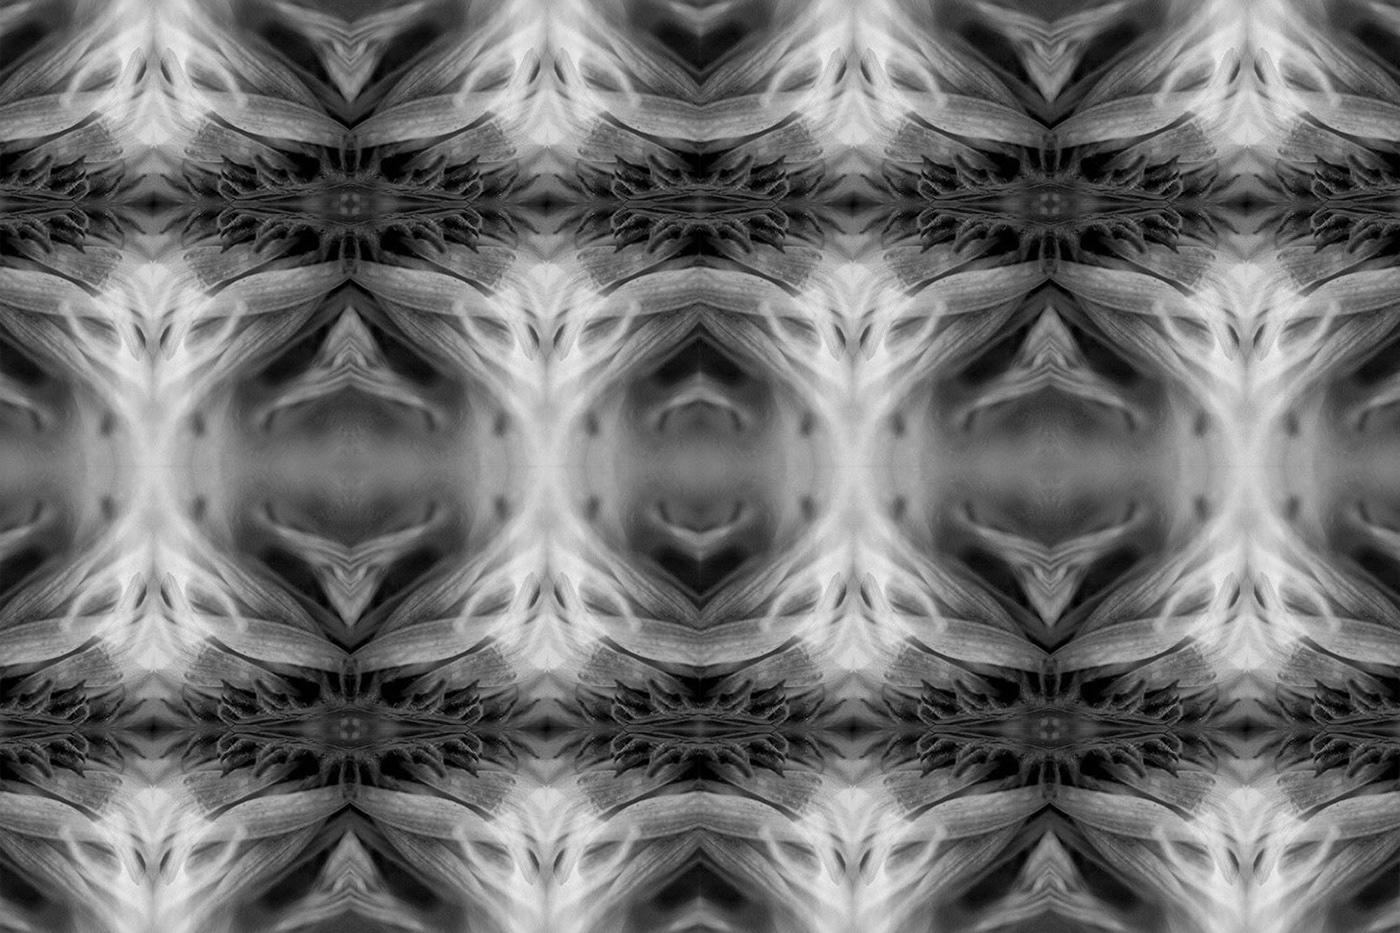 Kaleidoscope art experimentation using a flower to create a pattern.